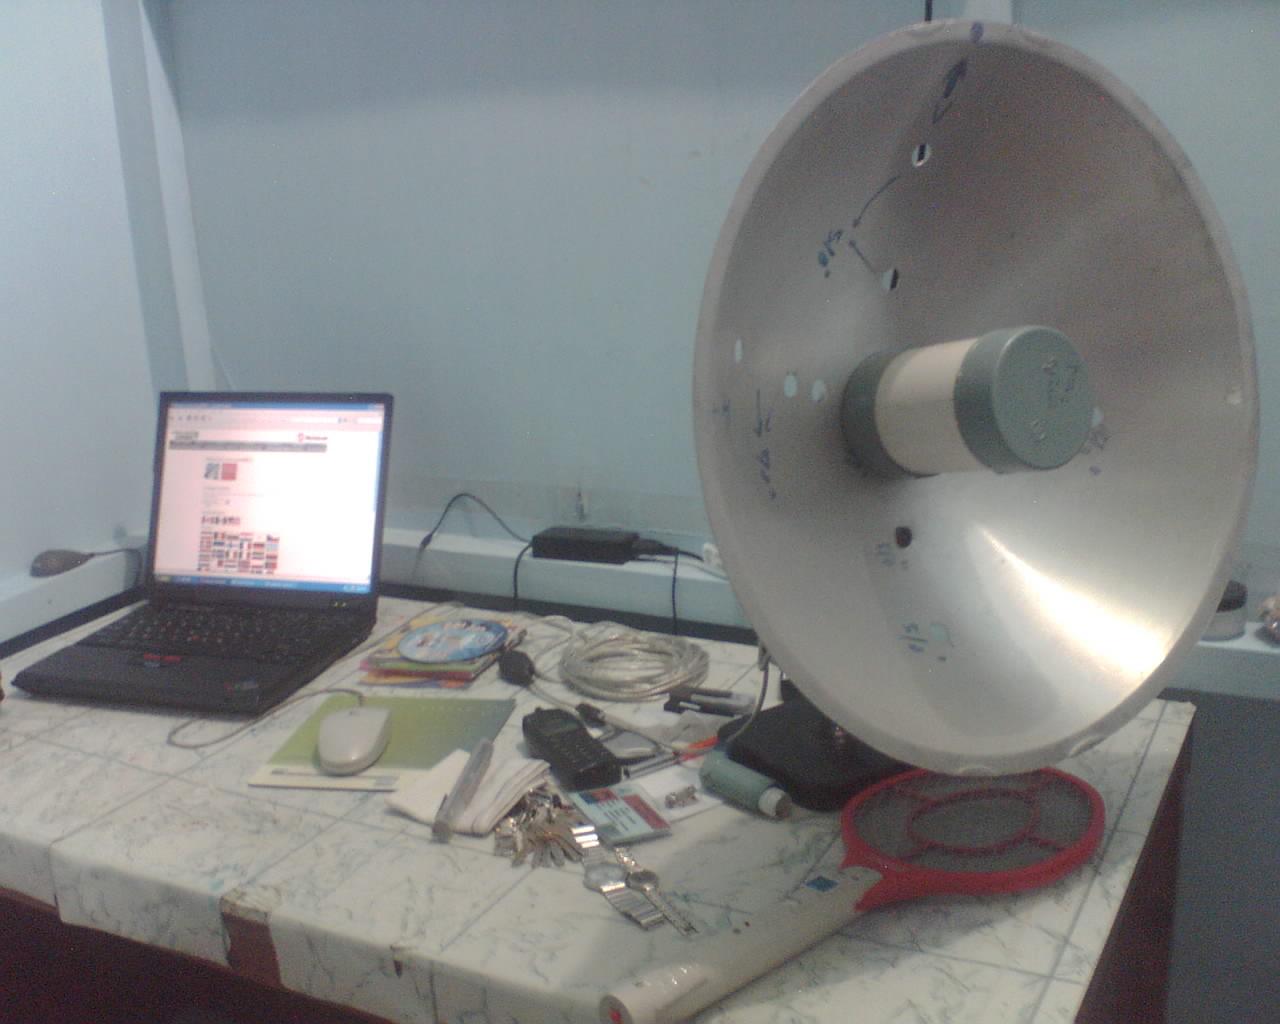 antena comment on this picture antena wajanbolic kenapa disebut wajan